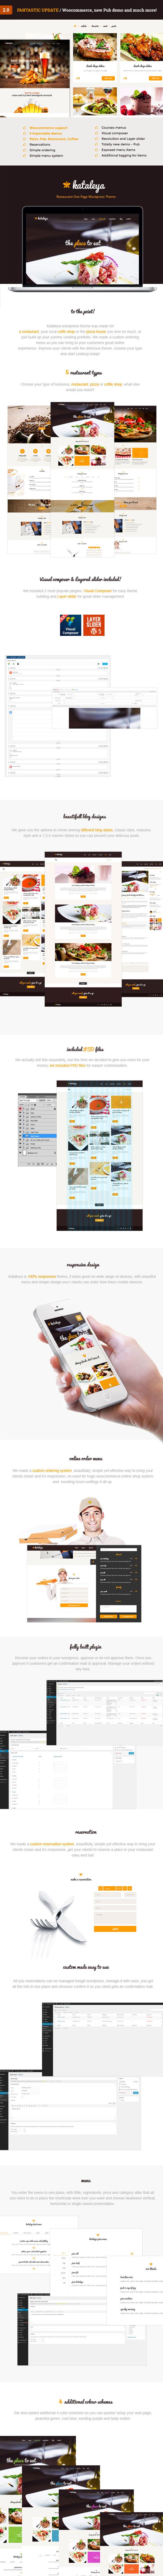 Kataleya - Restaurant Pizza Coffee WordPress Theme - 1